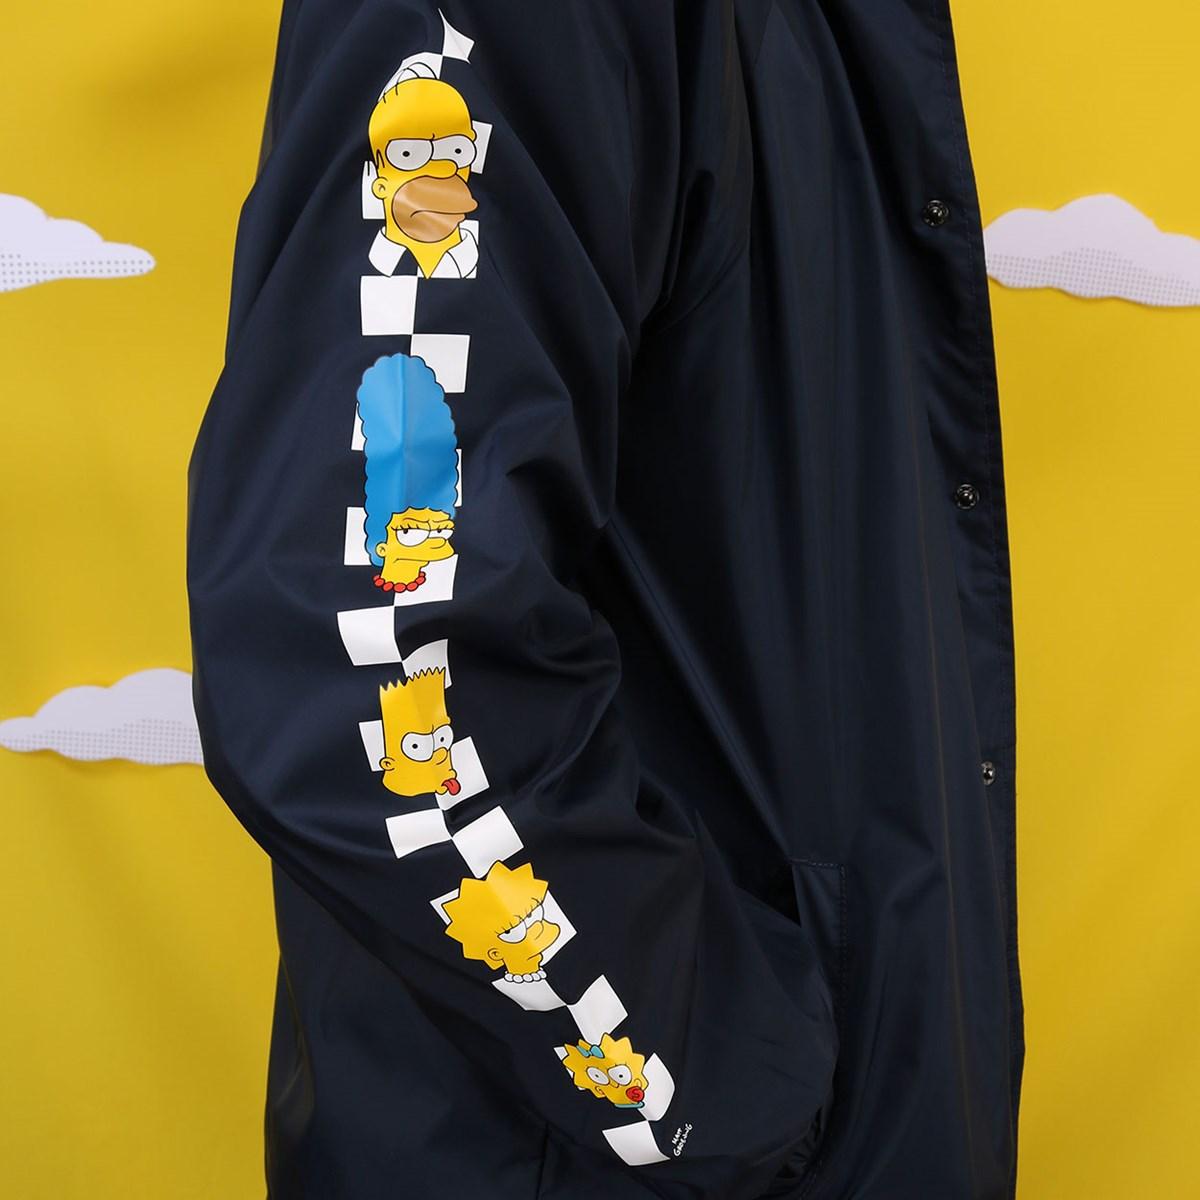 Jaqueta Vans The Simpsons Masculina Torrey Family VN0002MUZZZ